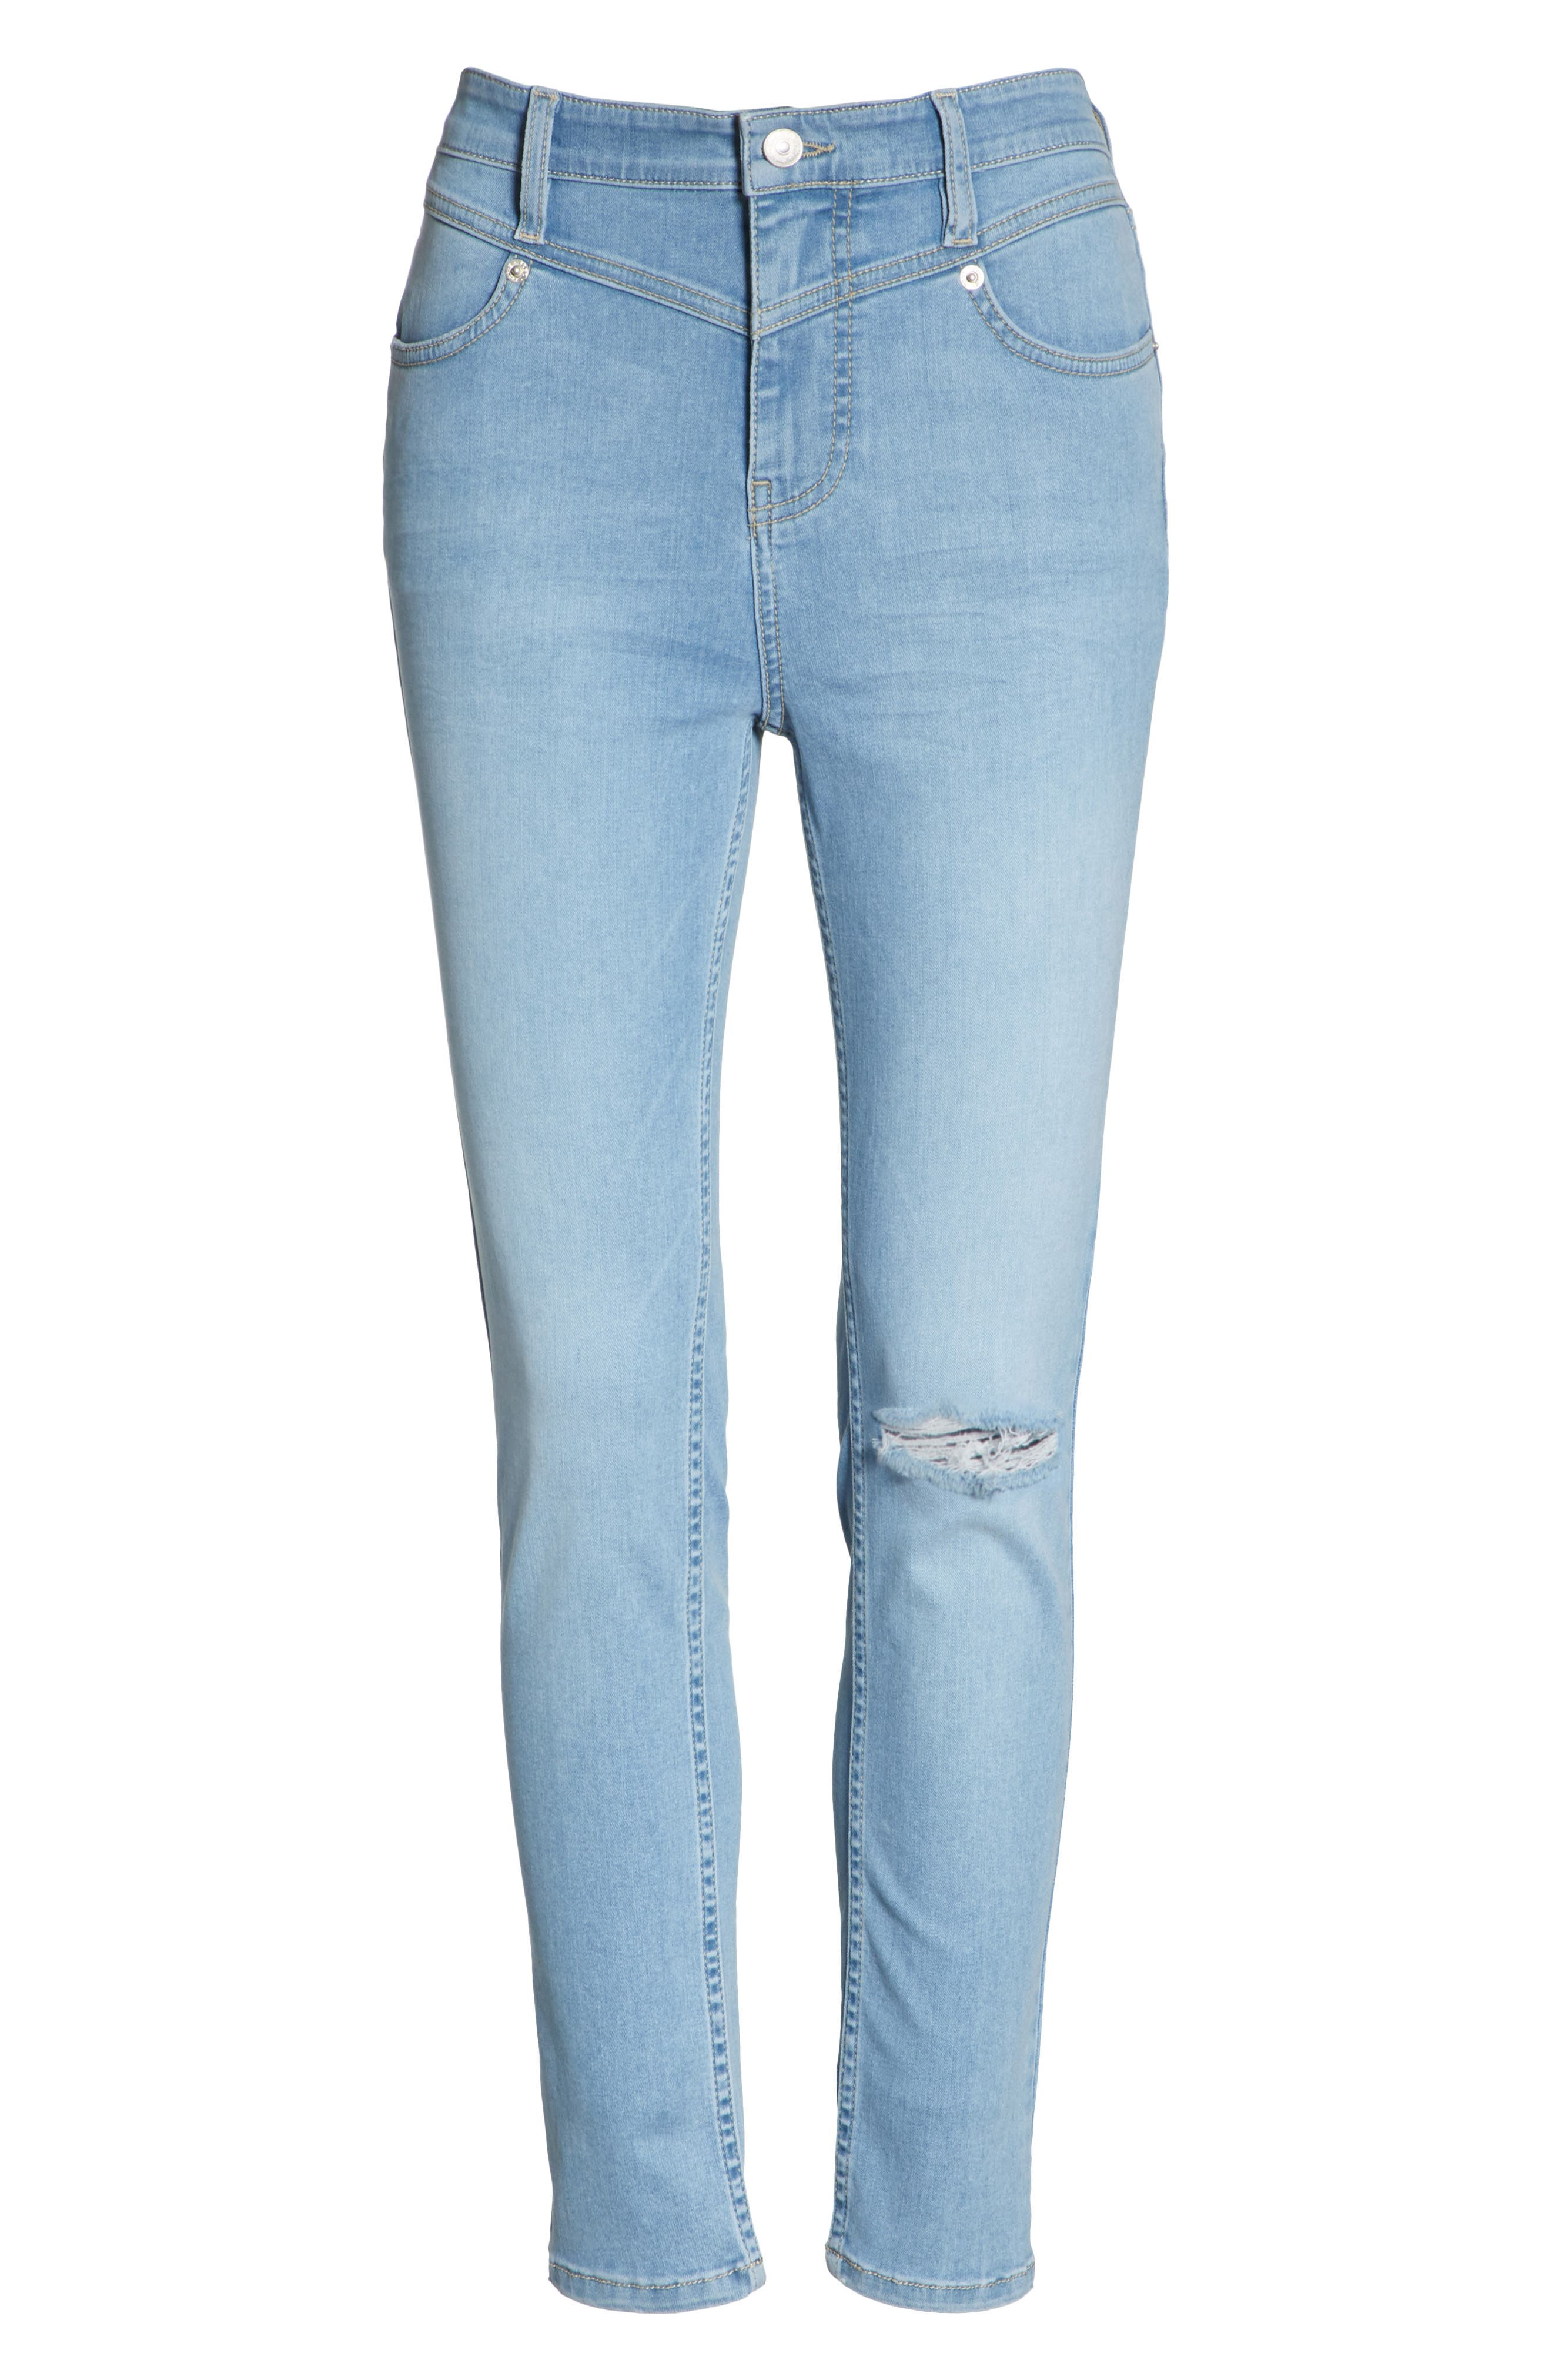 Mara Skinny Jeans,                             Alternate thumbnail 6, color,                             Blue